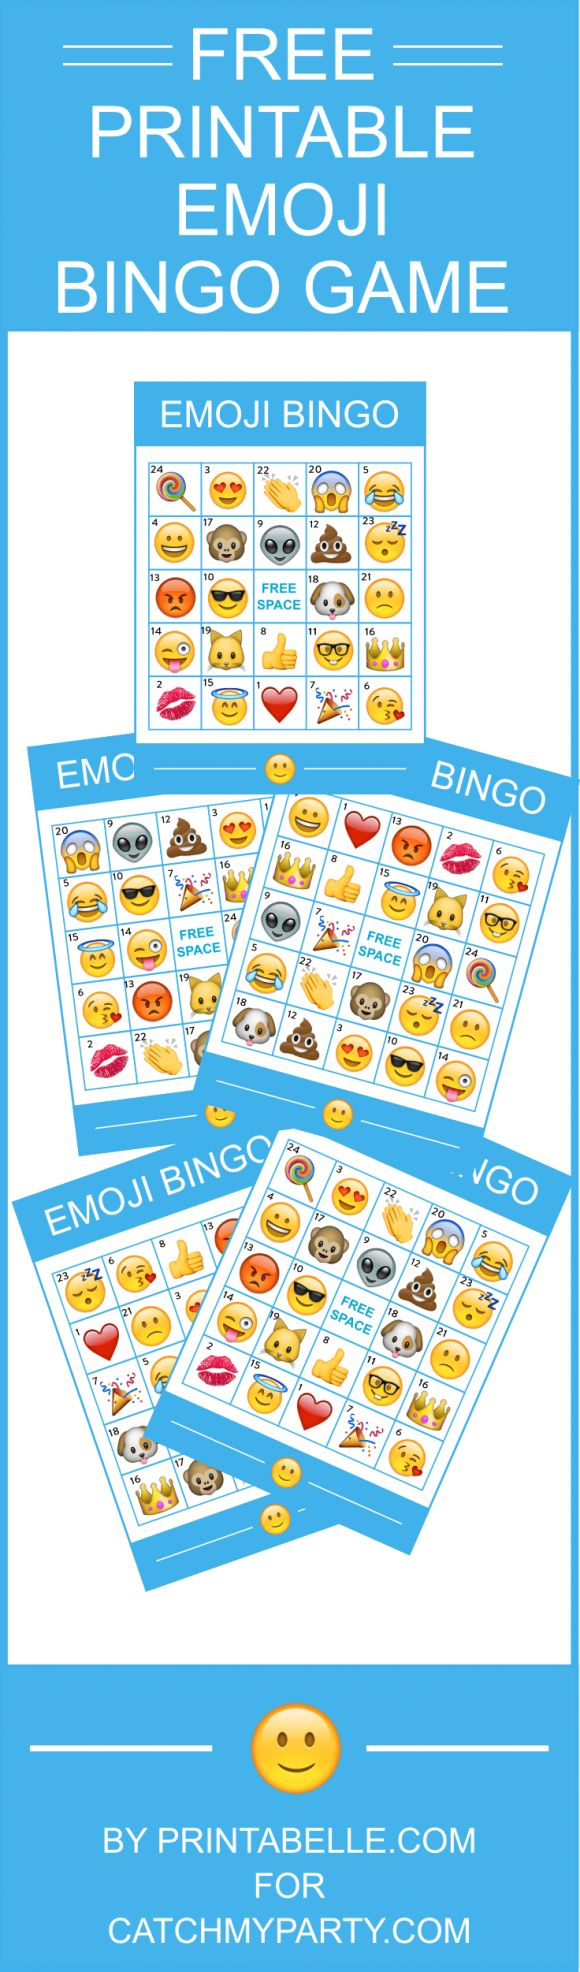 Free Printable Emoji Bingo Game